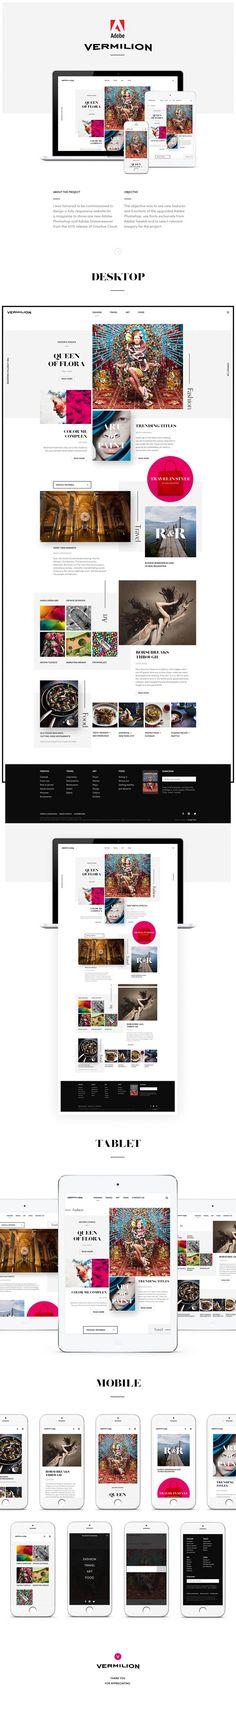 Official Showcase Website for Adobe